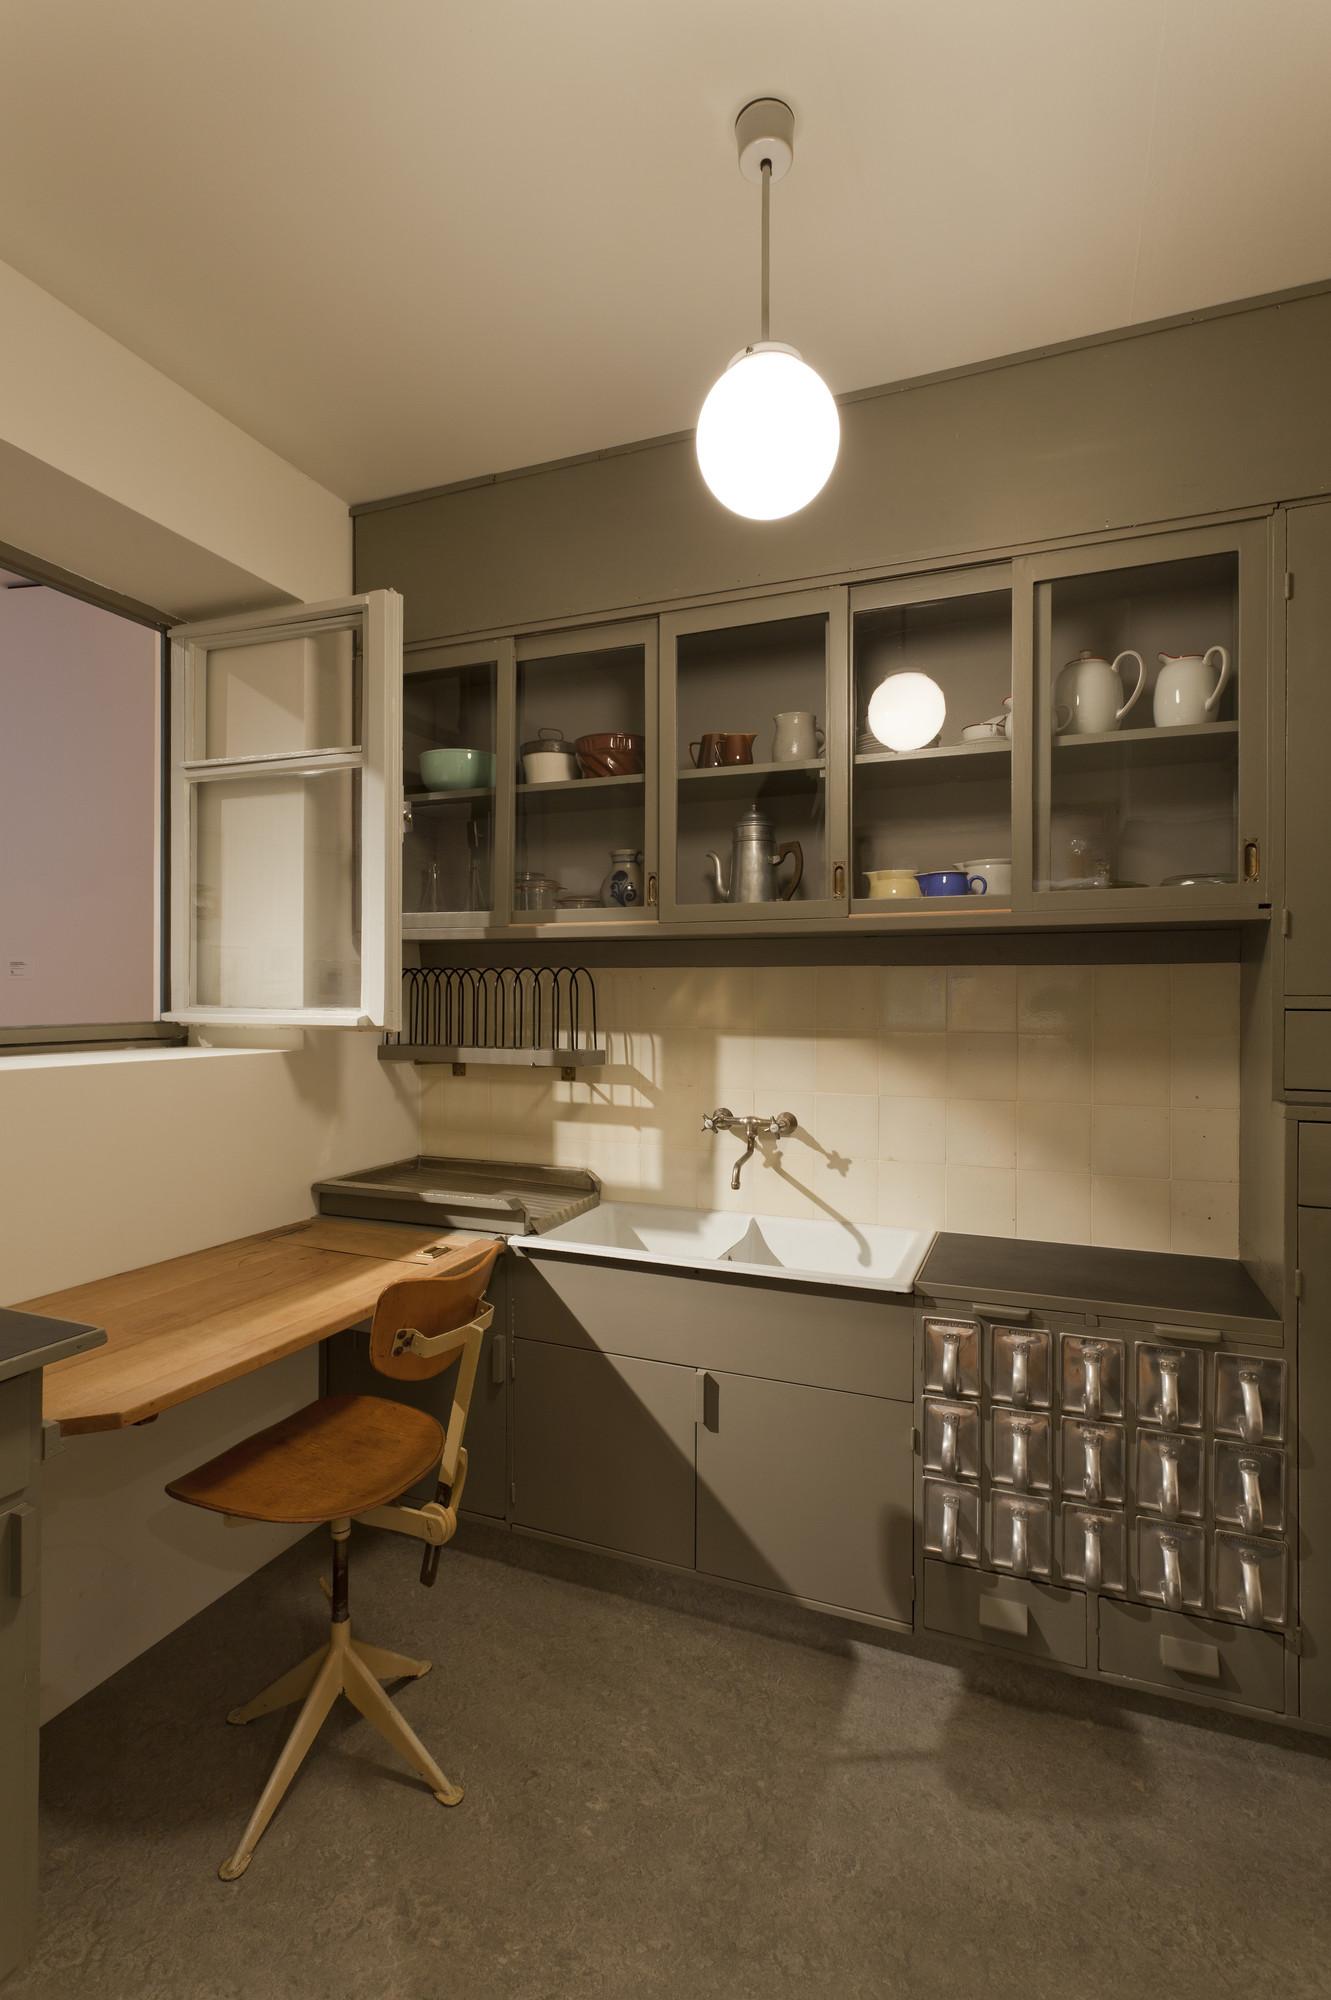 Grete Lihotzky Frankfurt Kitchen From The Ginnheim Hohenblick Housing Estate Frankfurt Am Main Germany 1926 1927 Moma